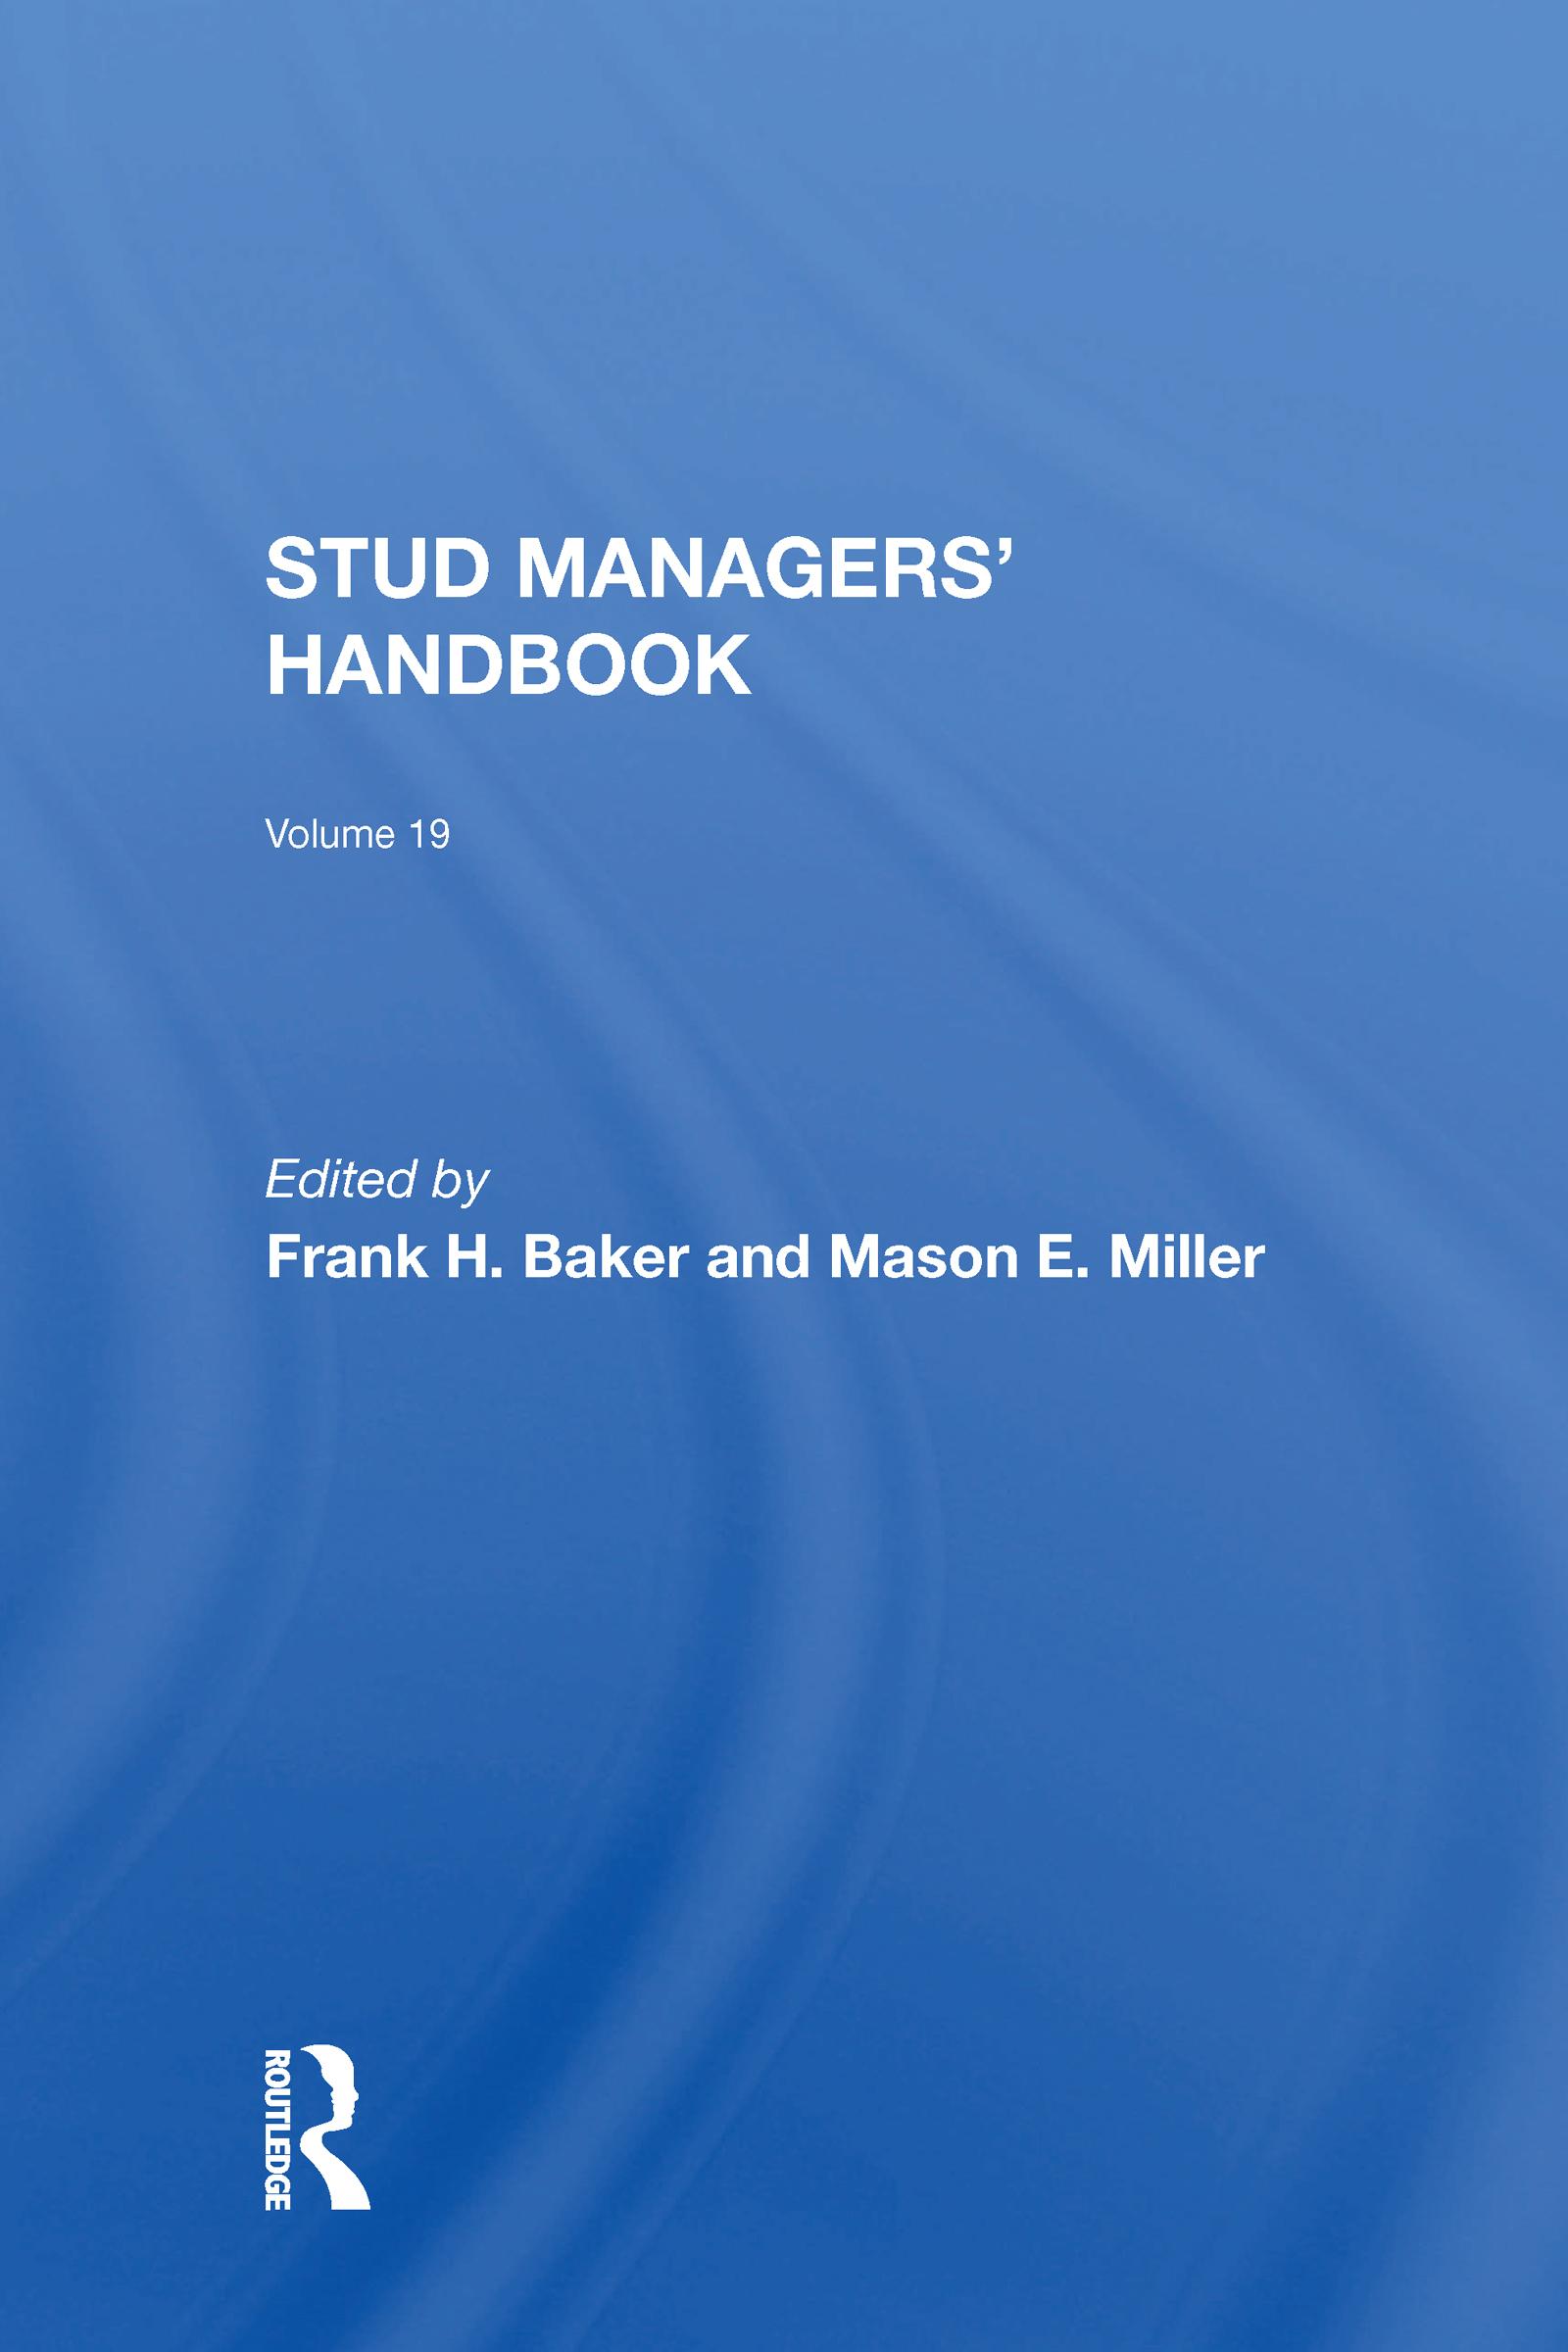 Stud Managers' Handbook, Vol. 19